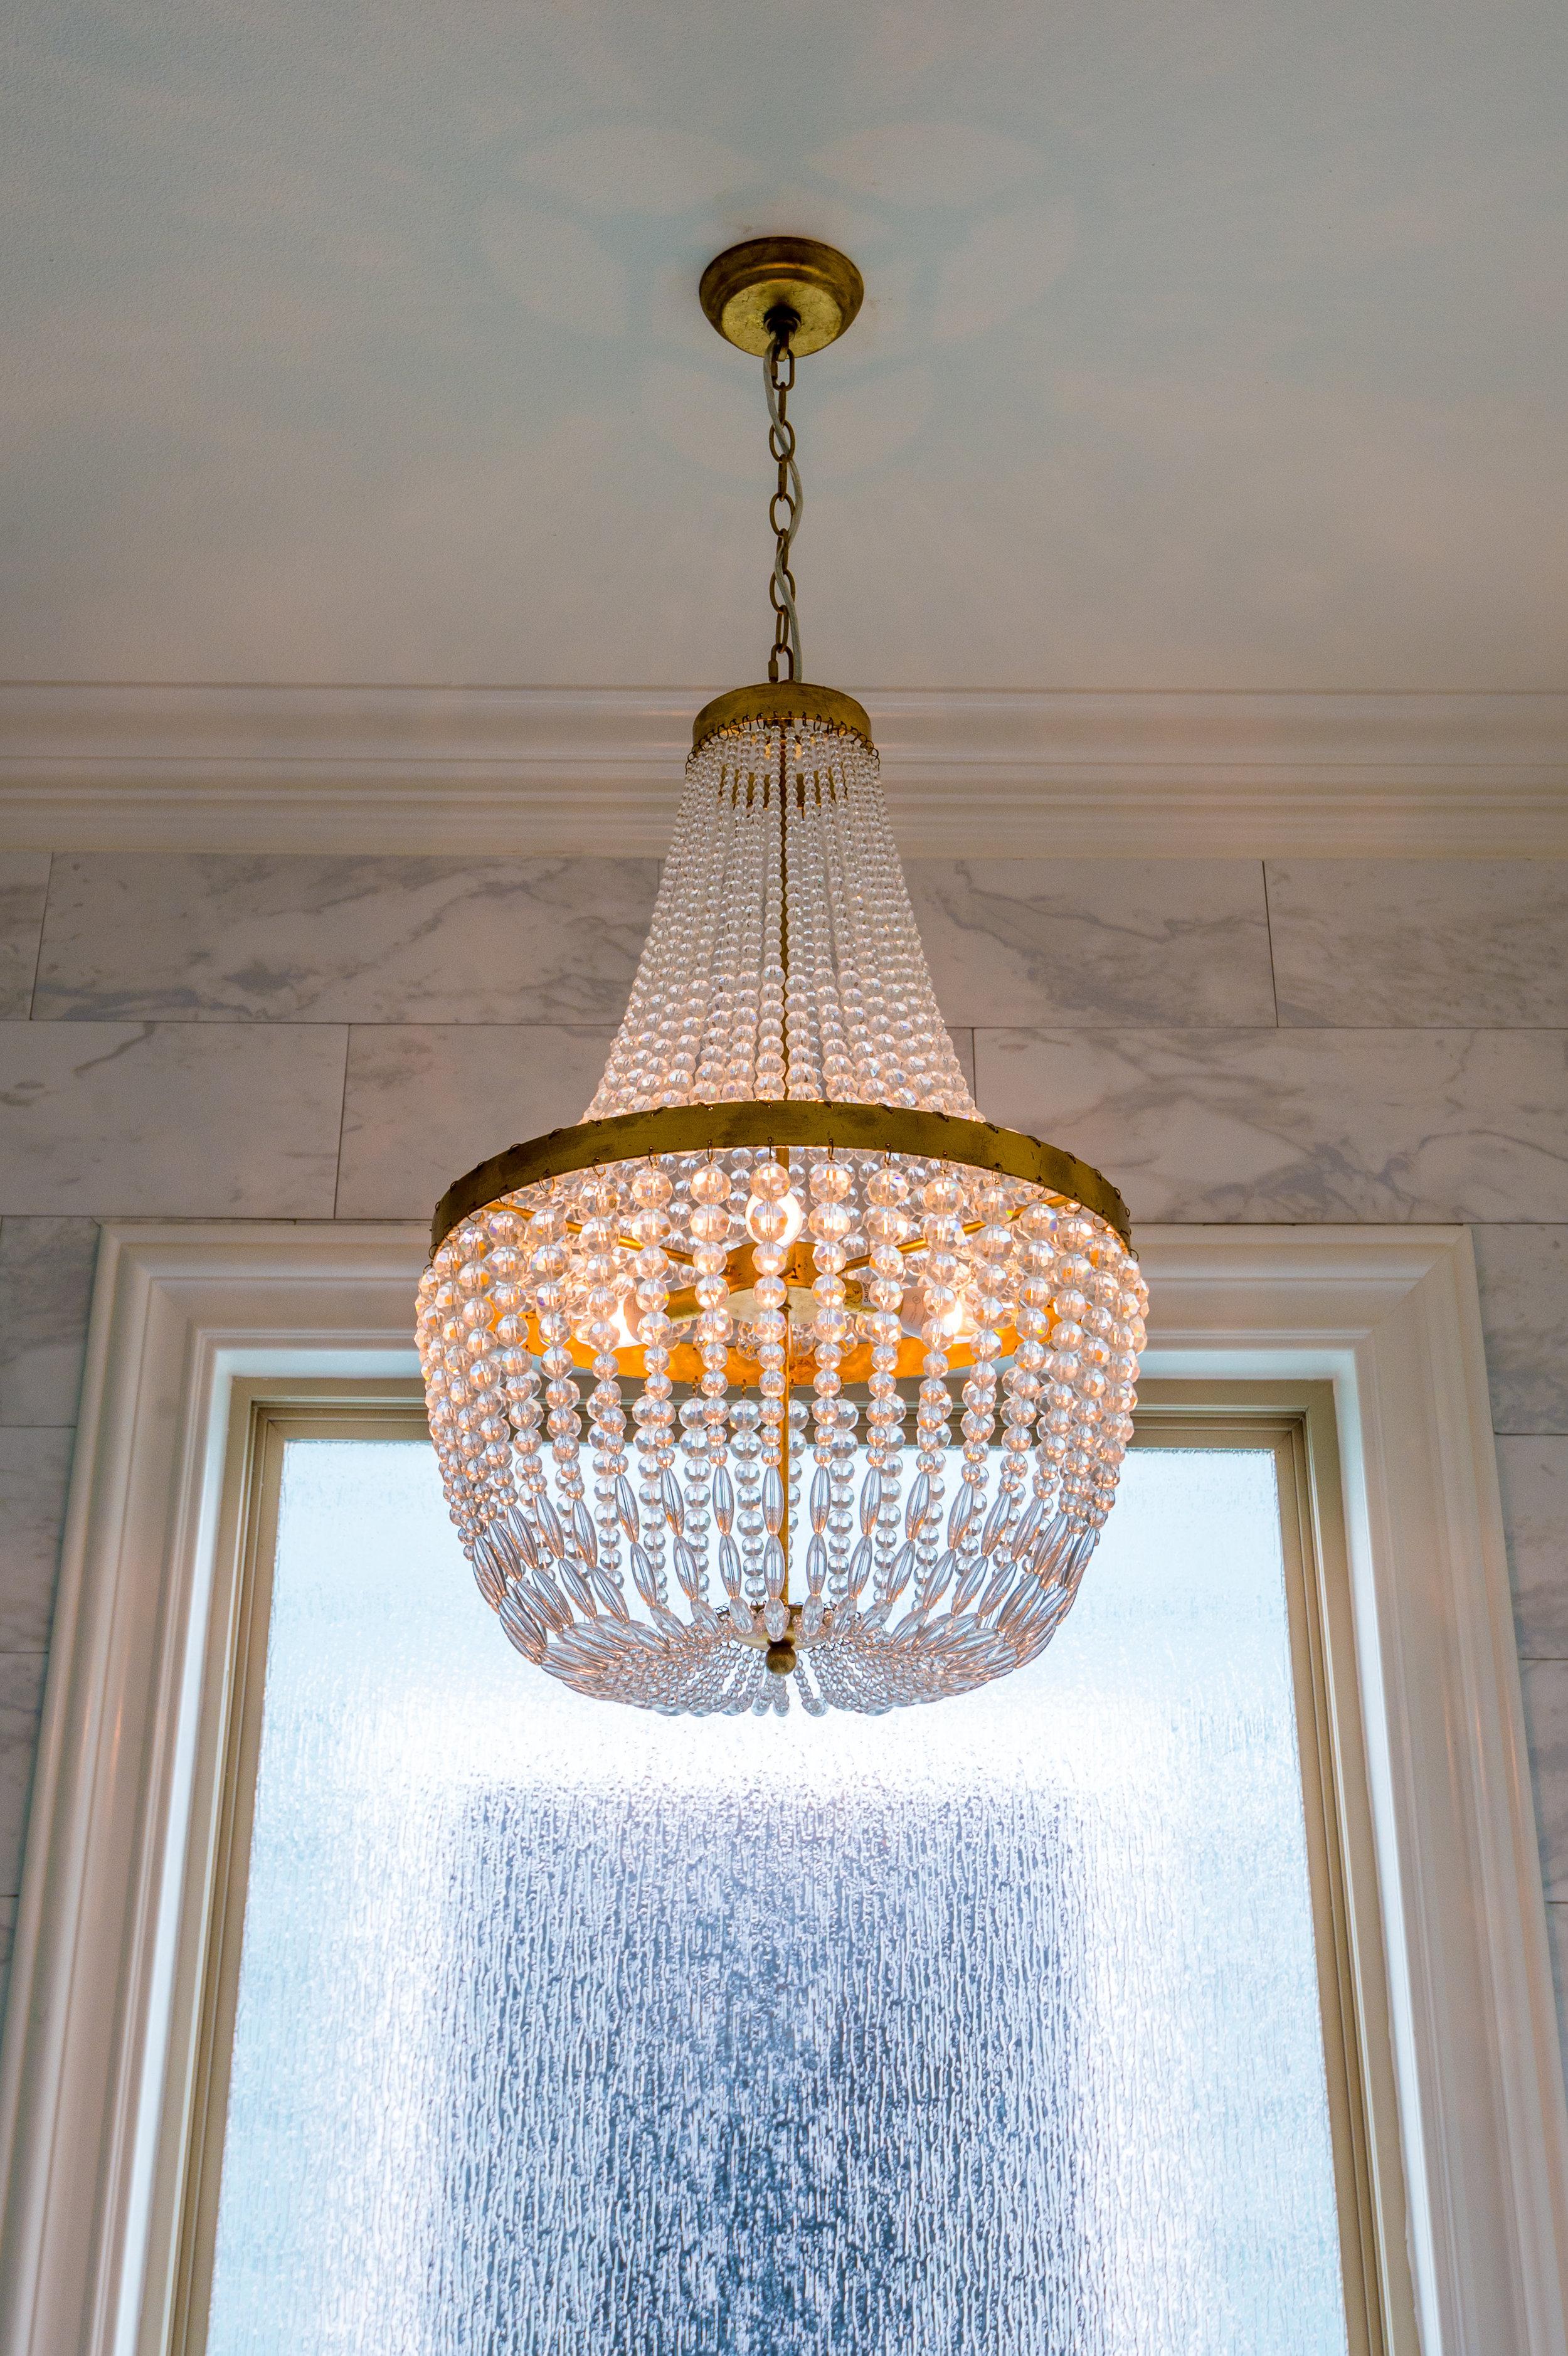 freestanding bathtub chandelier metairie residential interior design khb interiors